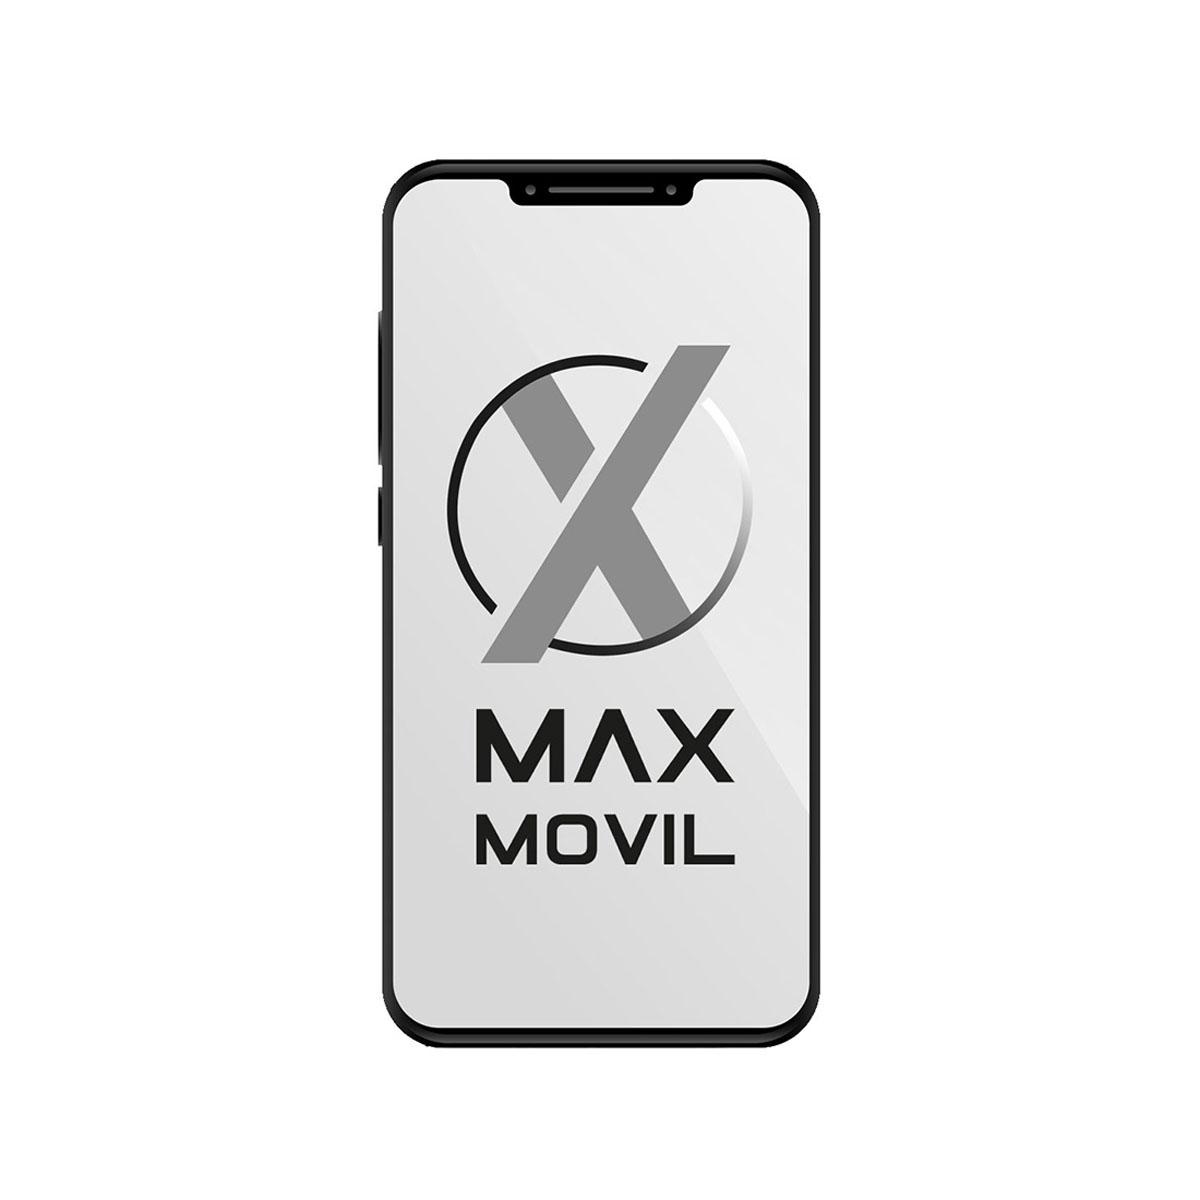 Funda de tipo libro para tu iOcean X8 mini/x8 mini pro negra